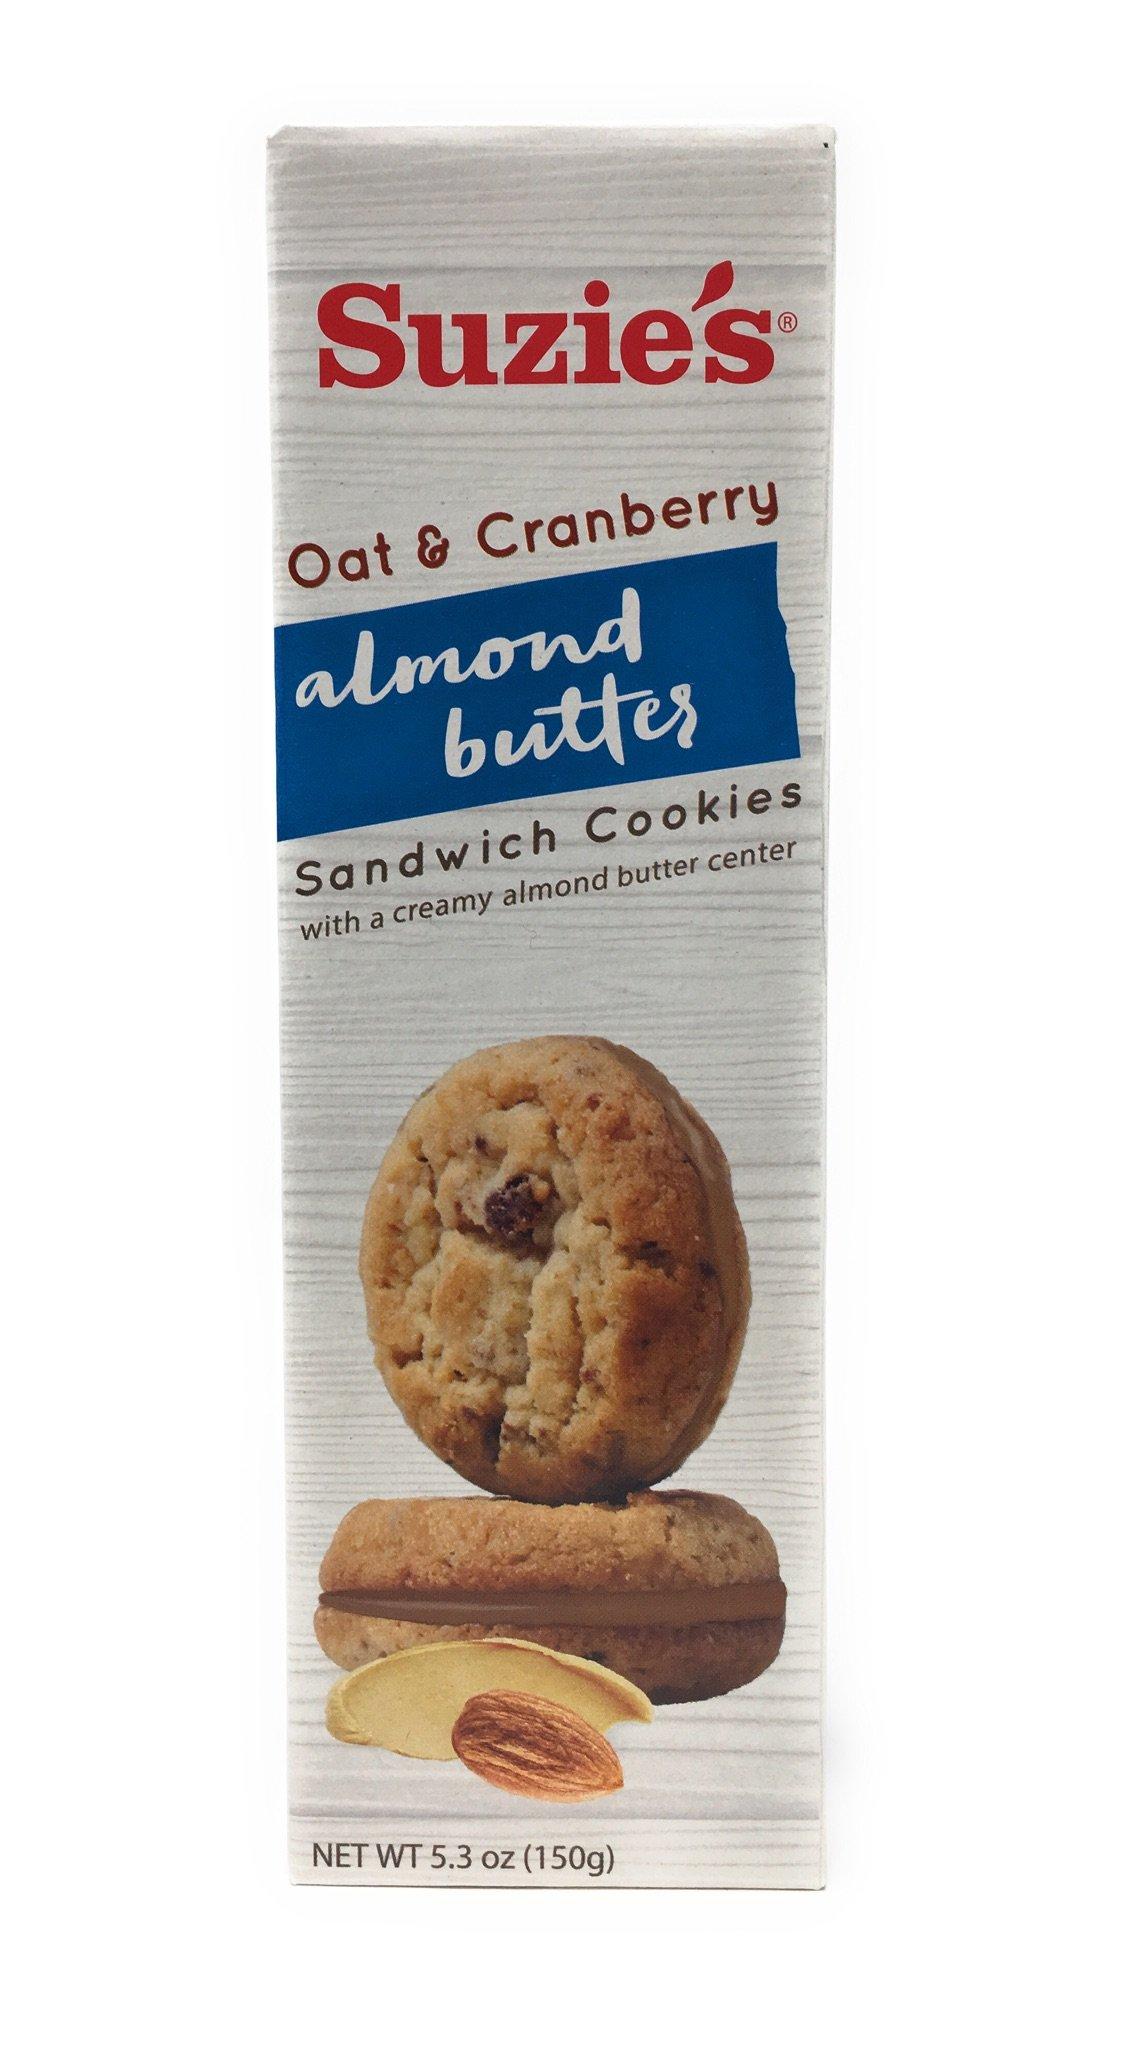 Suzie's Oat & Cranberry Almond Butter Sandwich Cookie, 5.3 oz. (Pack of 6)